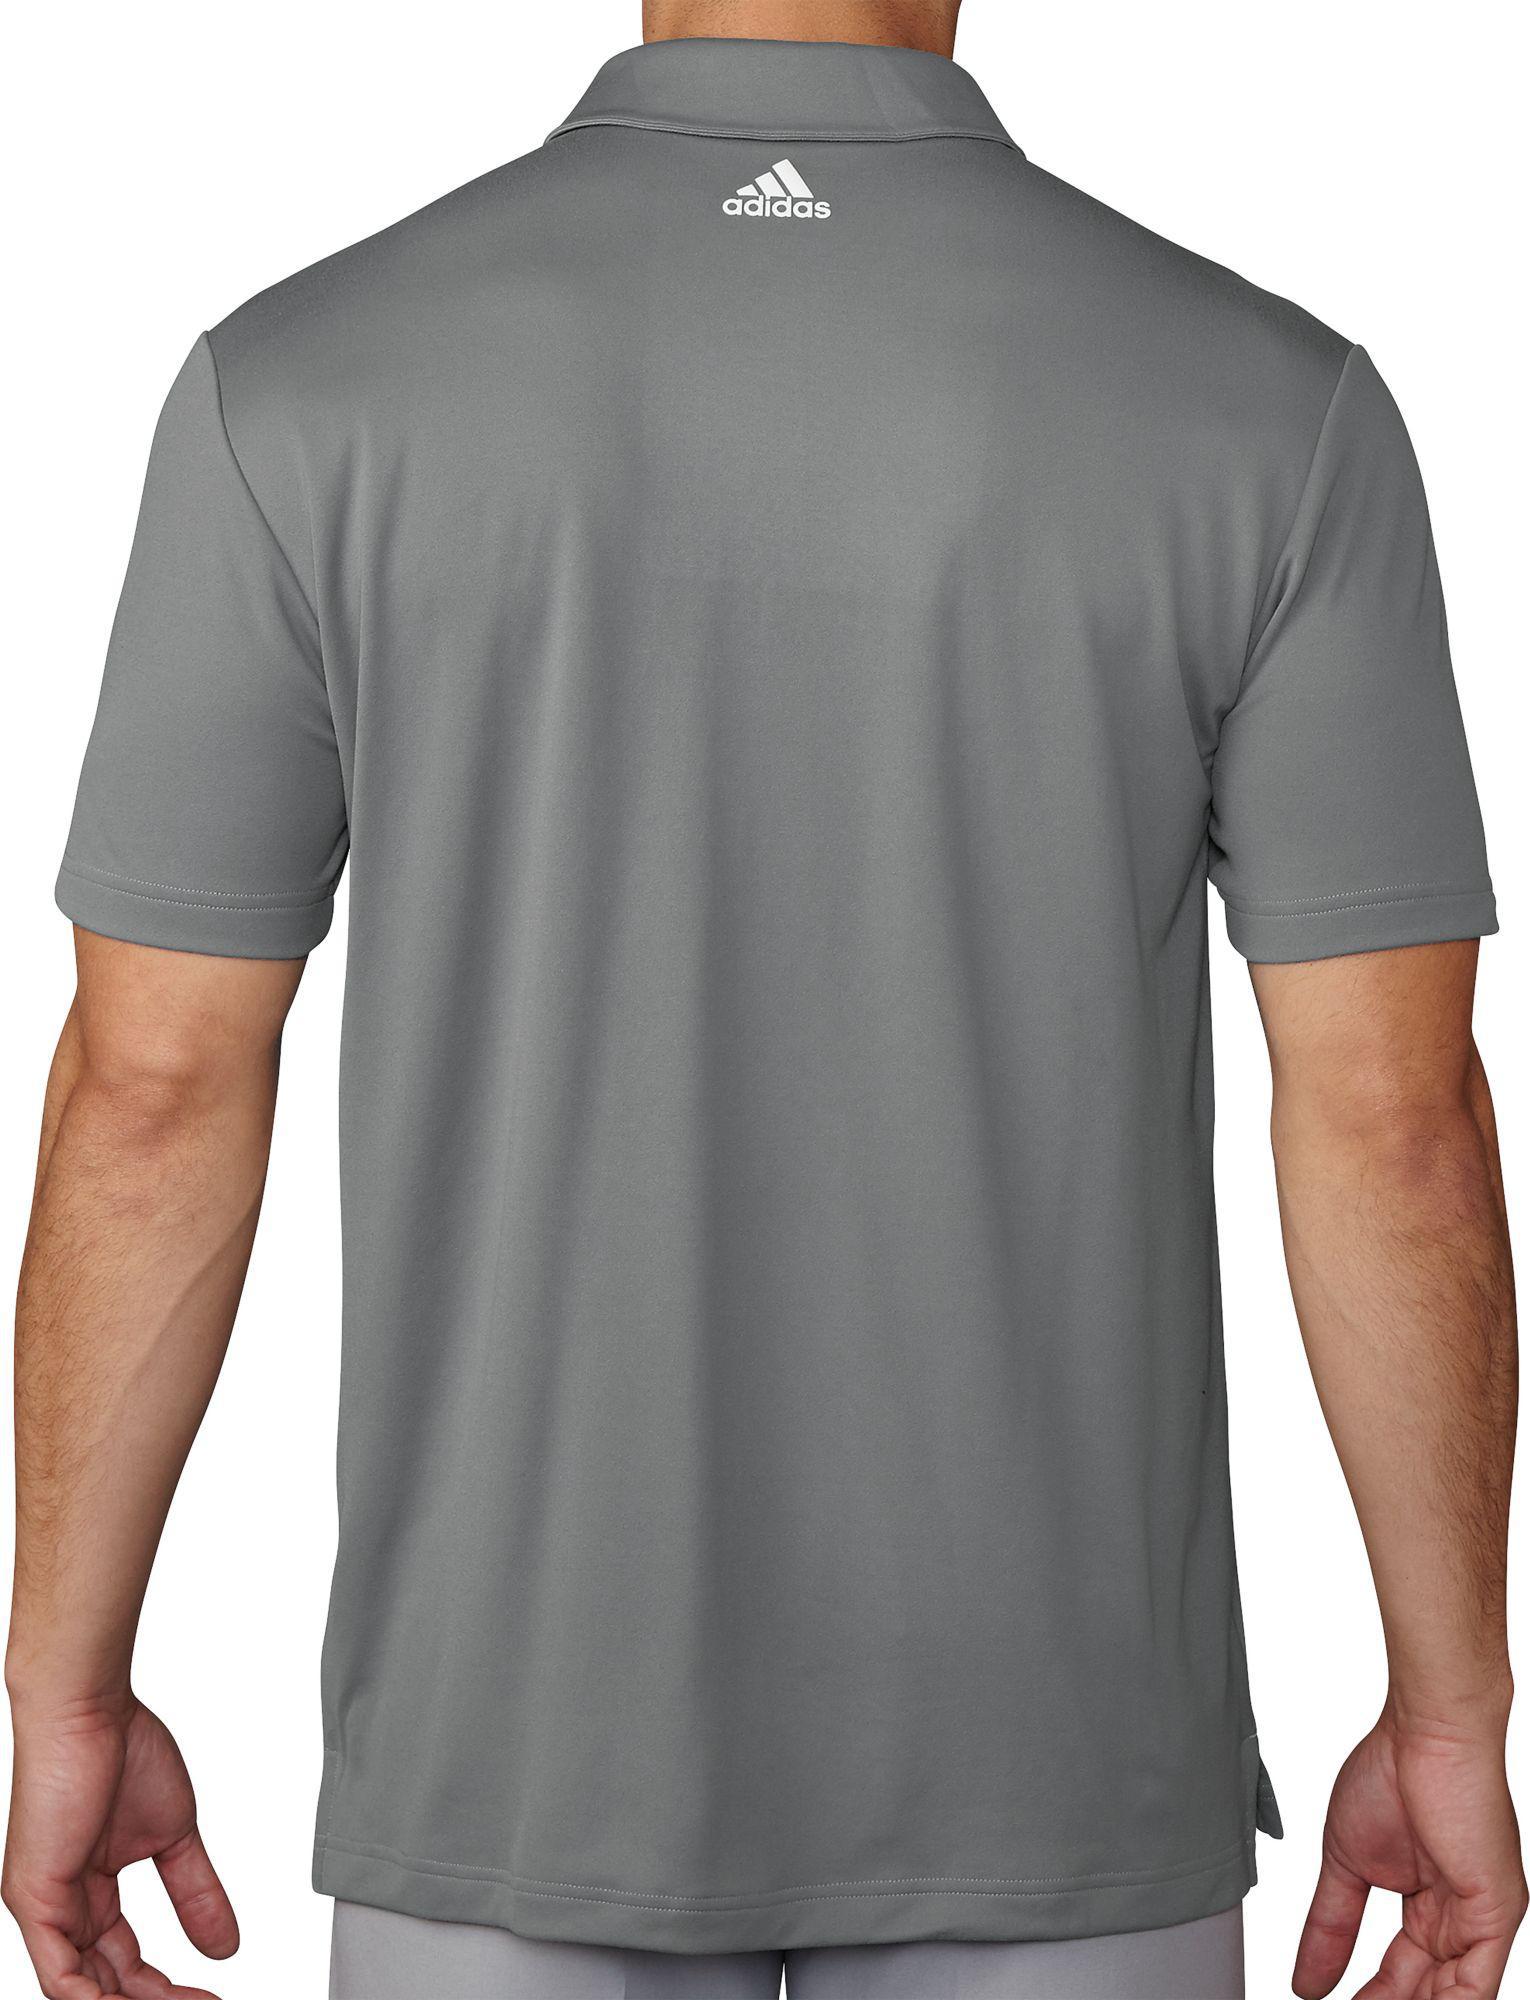 innovative design 57ee3 f2054 Adidas Climacool 3 Stripes Soft Jersey Golf Polo Shirt